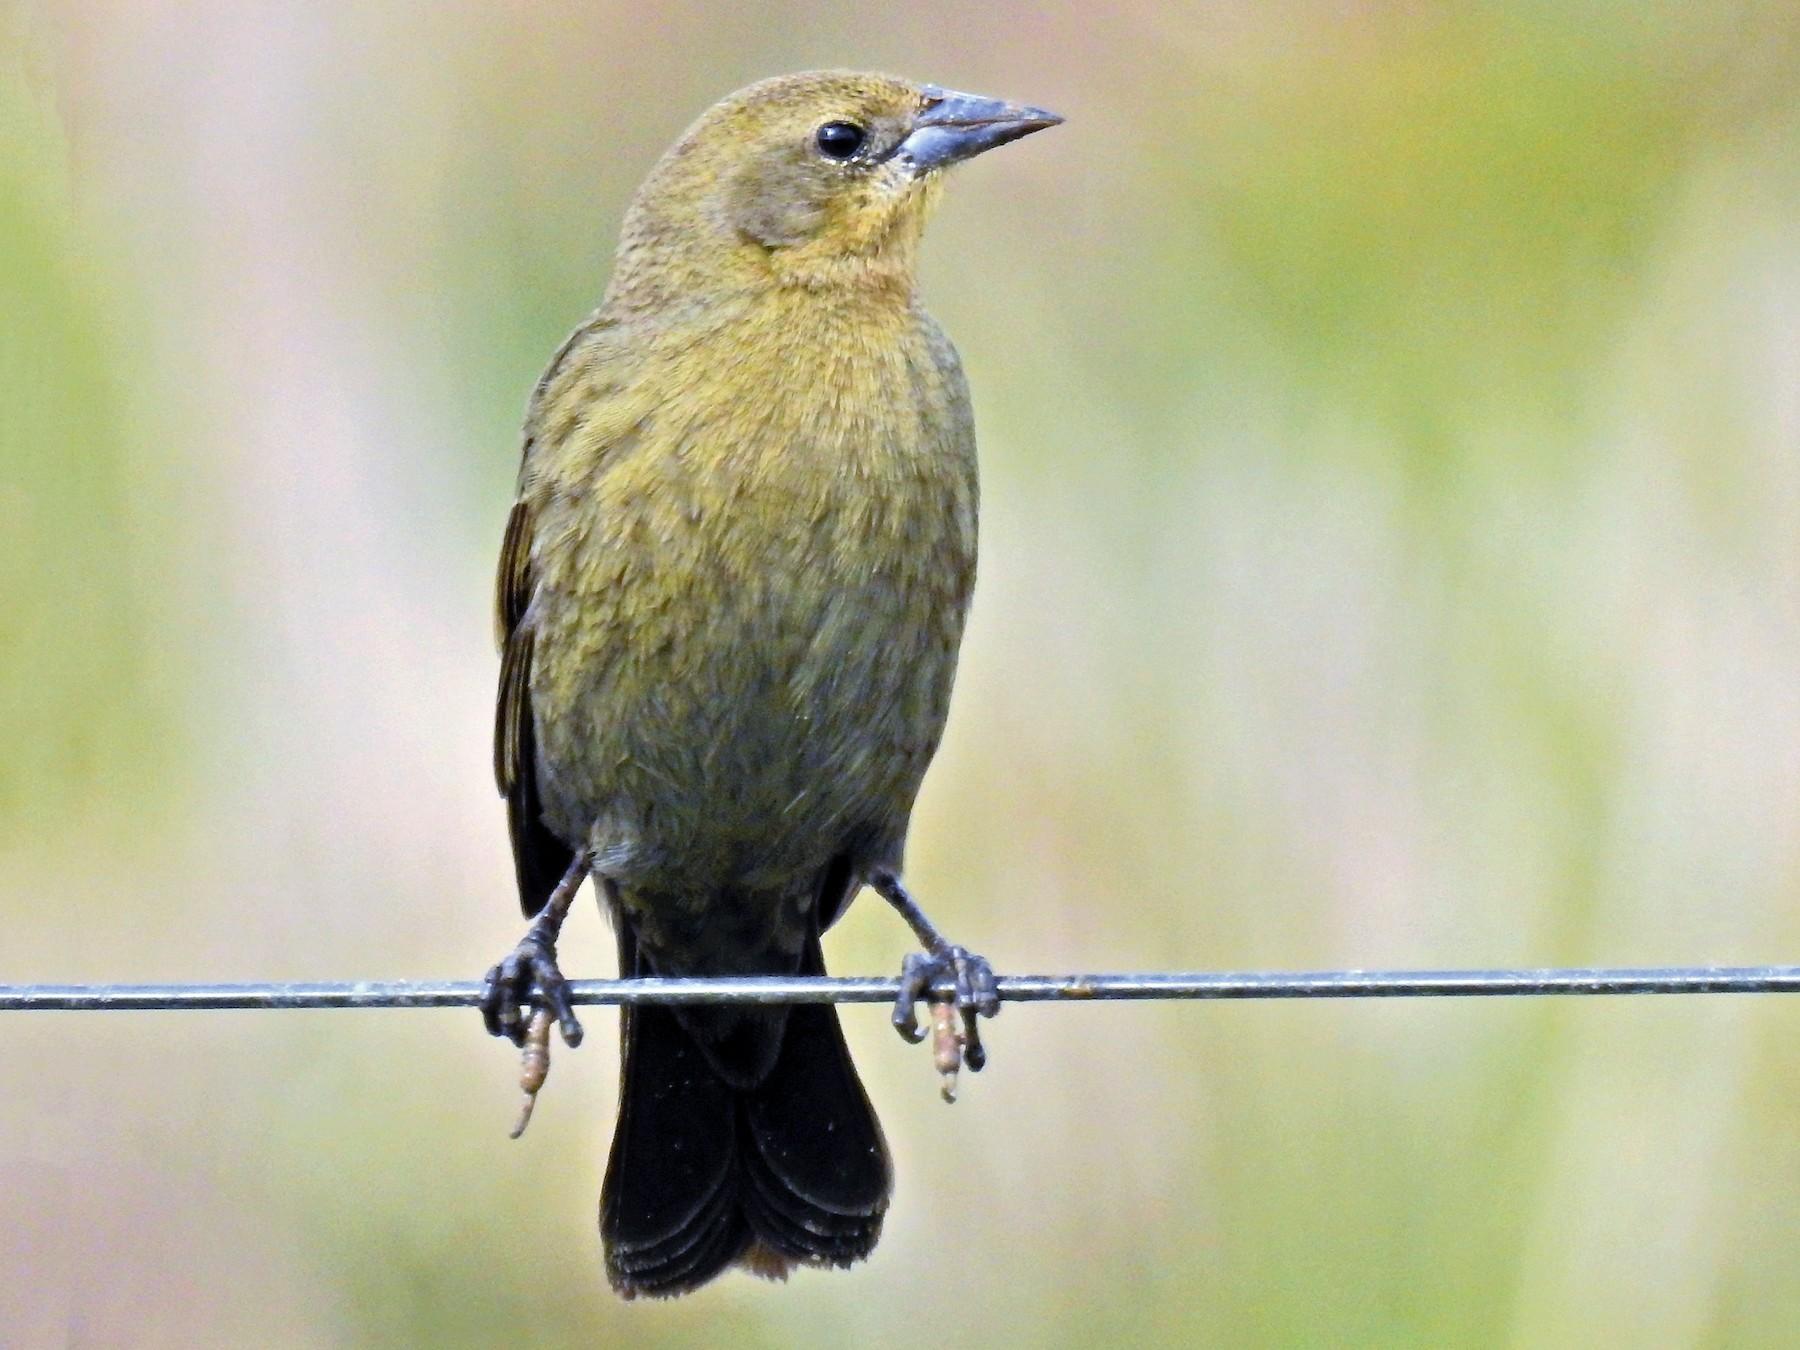 Chestnut-capped Blackbird - CLAUDIO FILHO